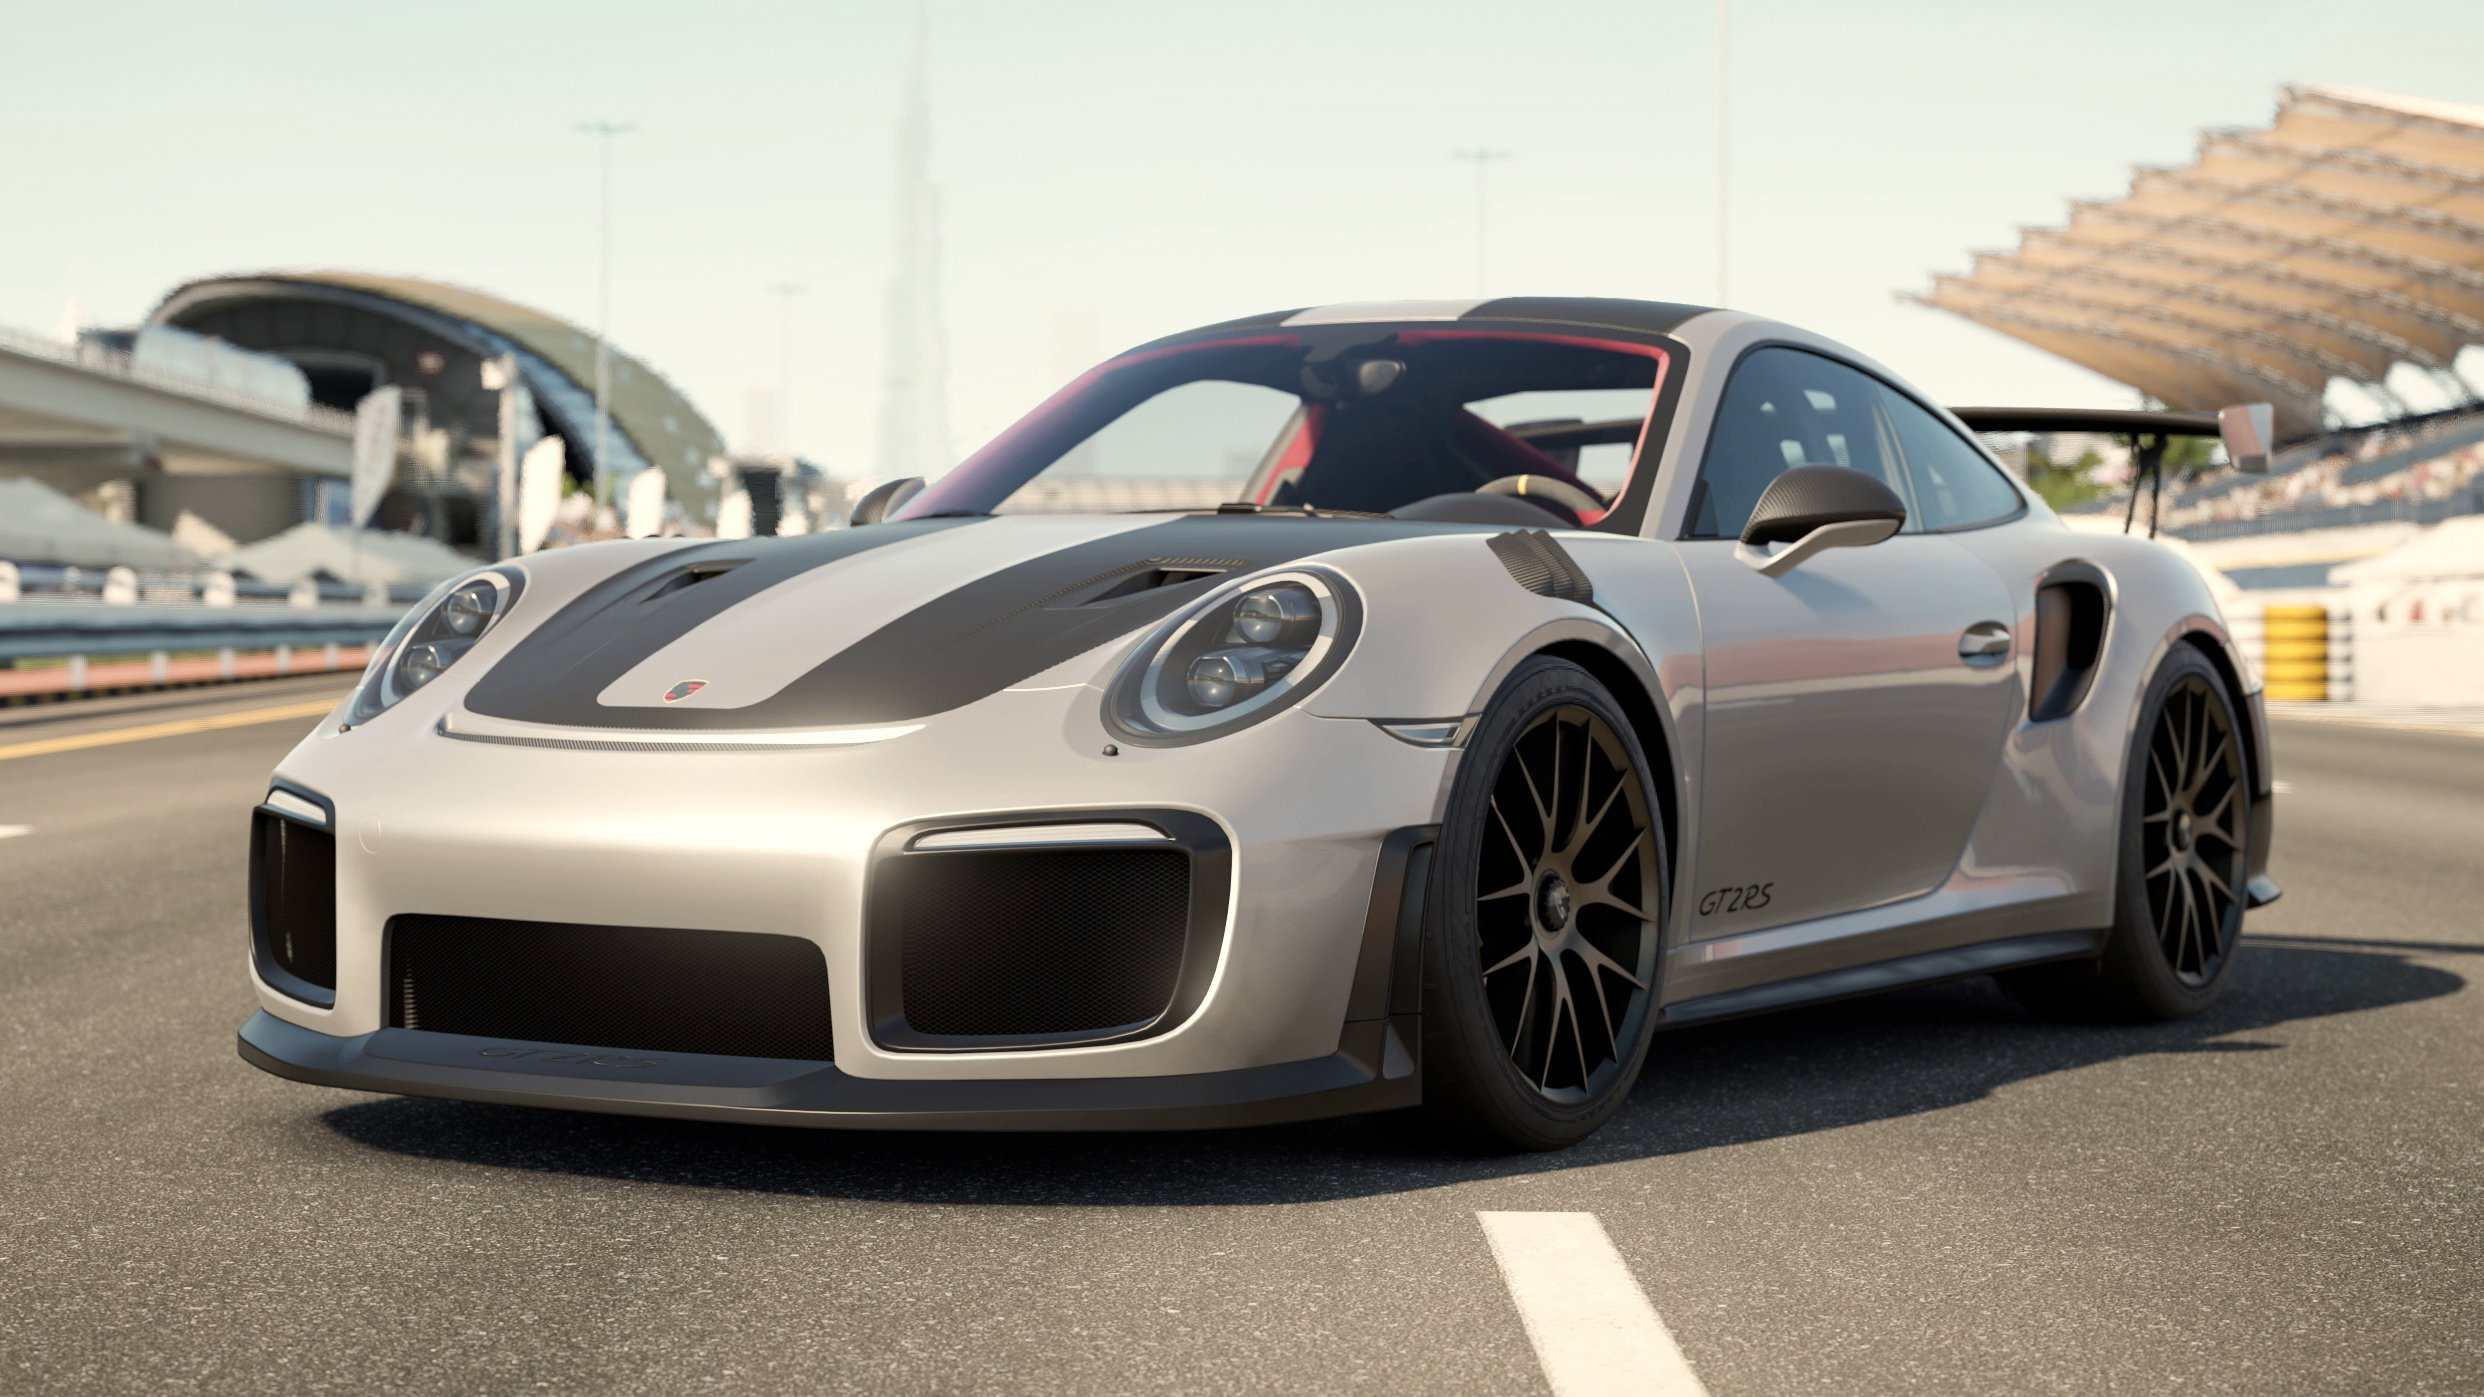 Forza Motorsport 7 Porsche GT2 RS Front